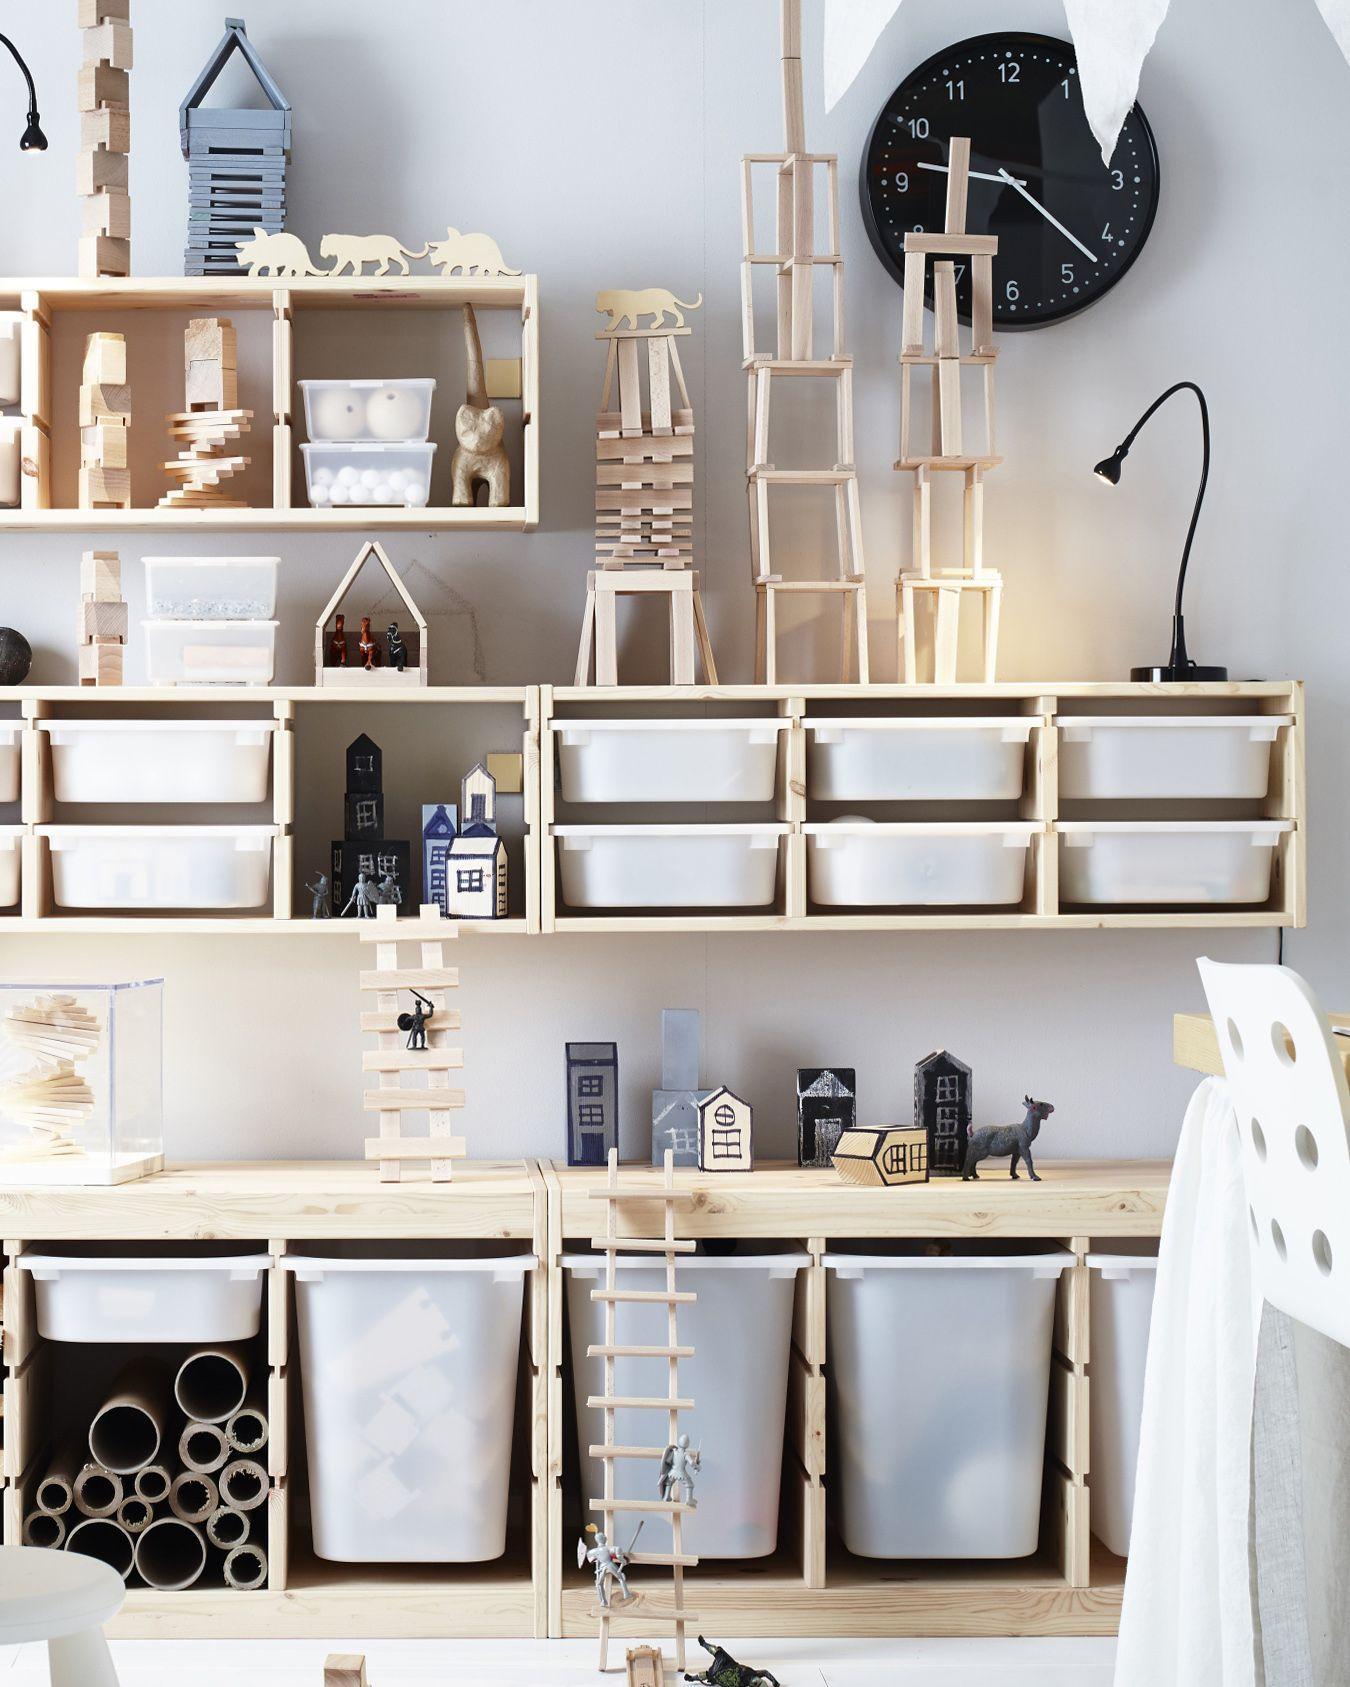 19 unique toy storage ideas for kid's playroom bedroom